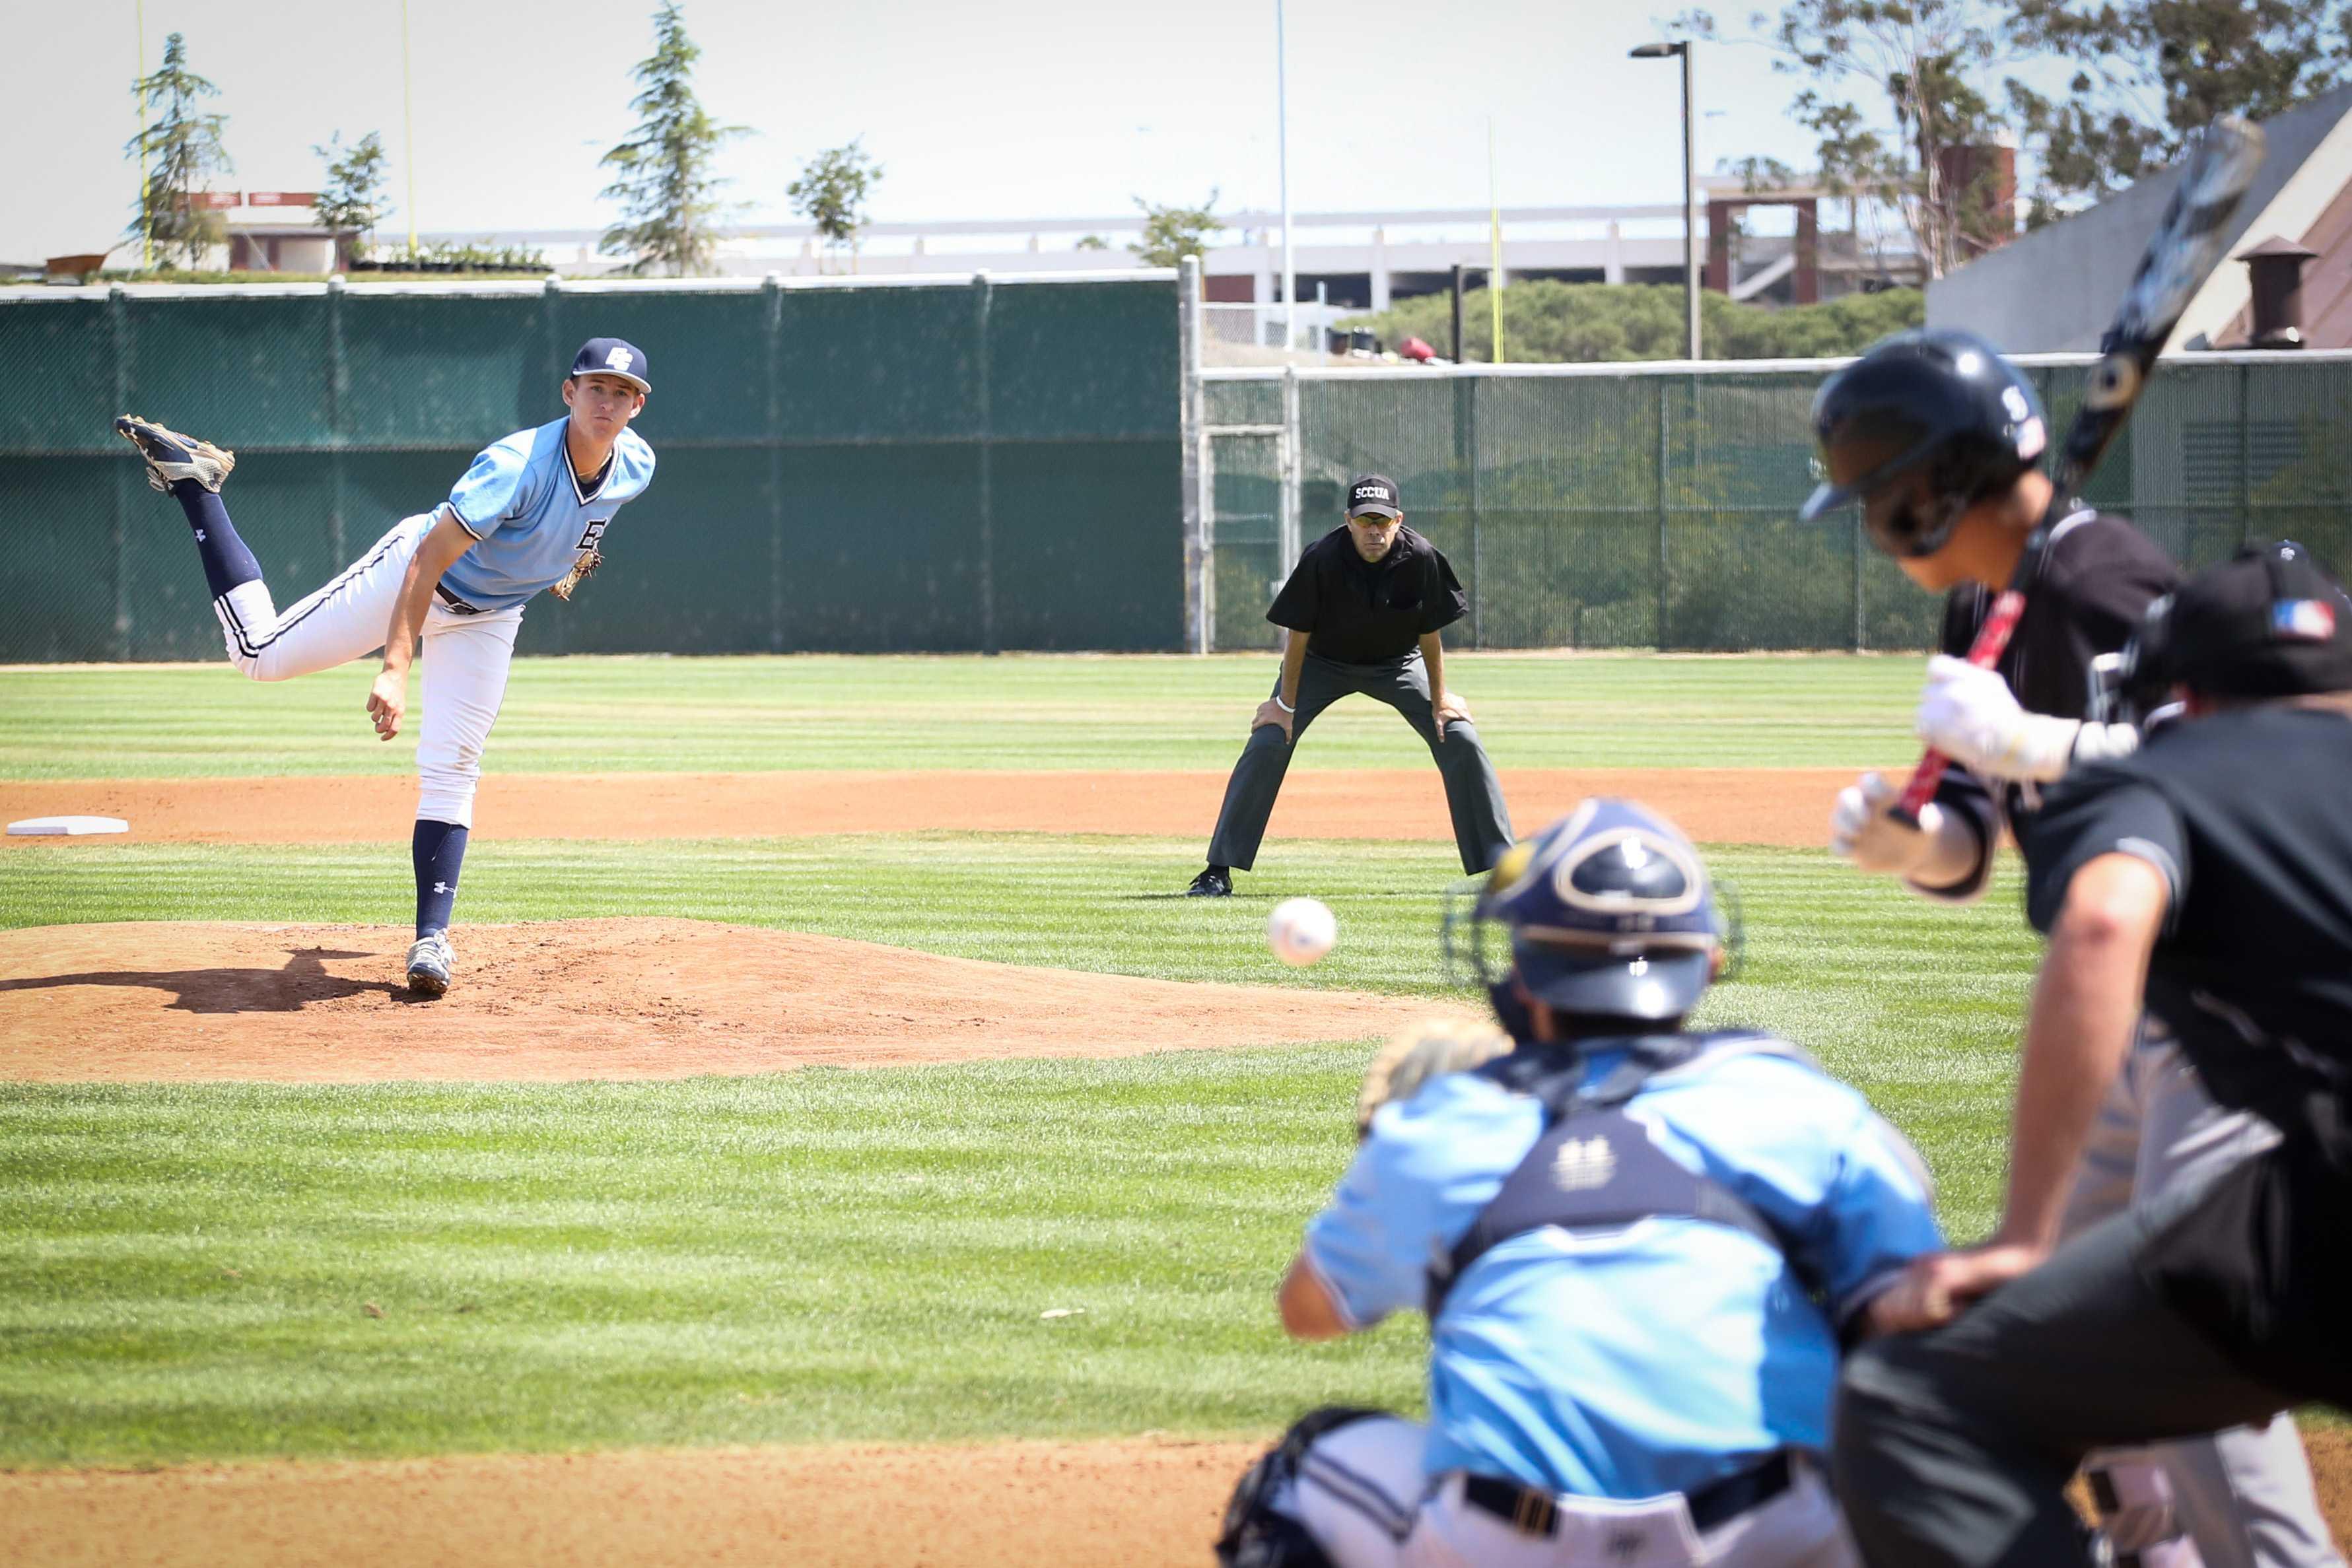 Baseball team falls to Long Beach City College in last game of regular season